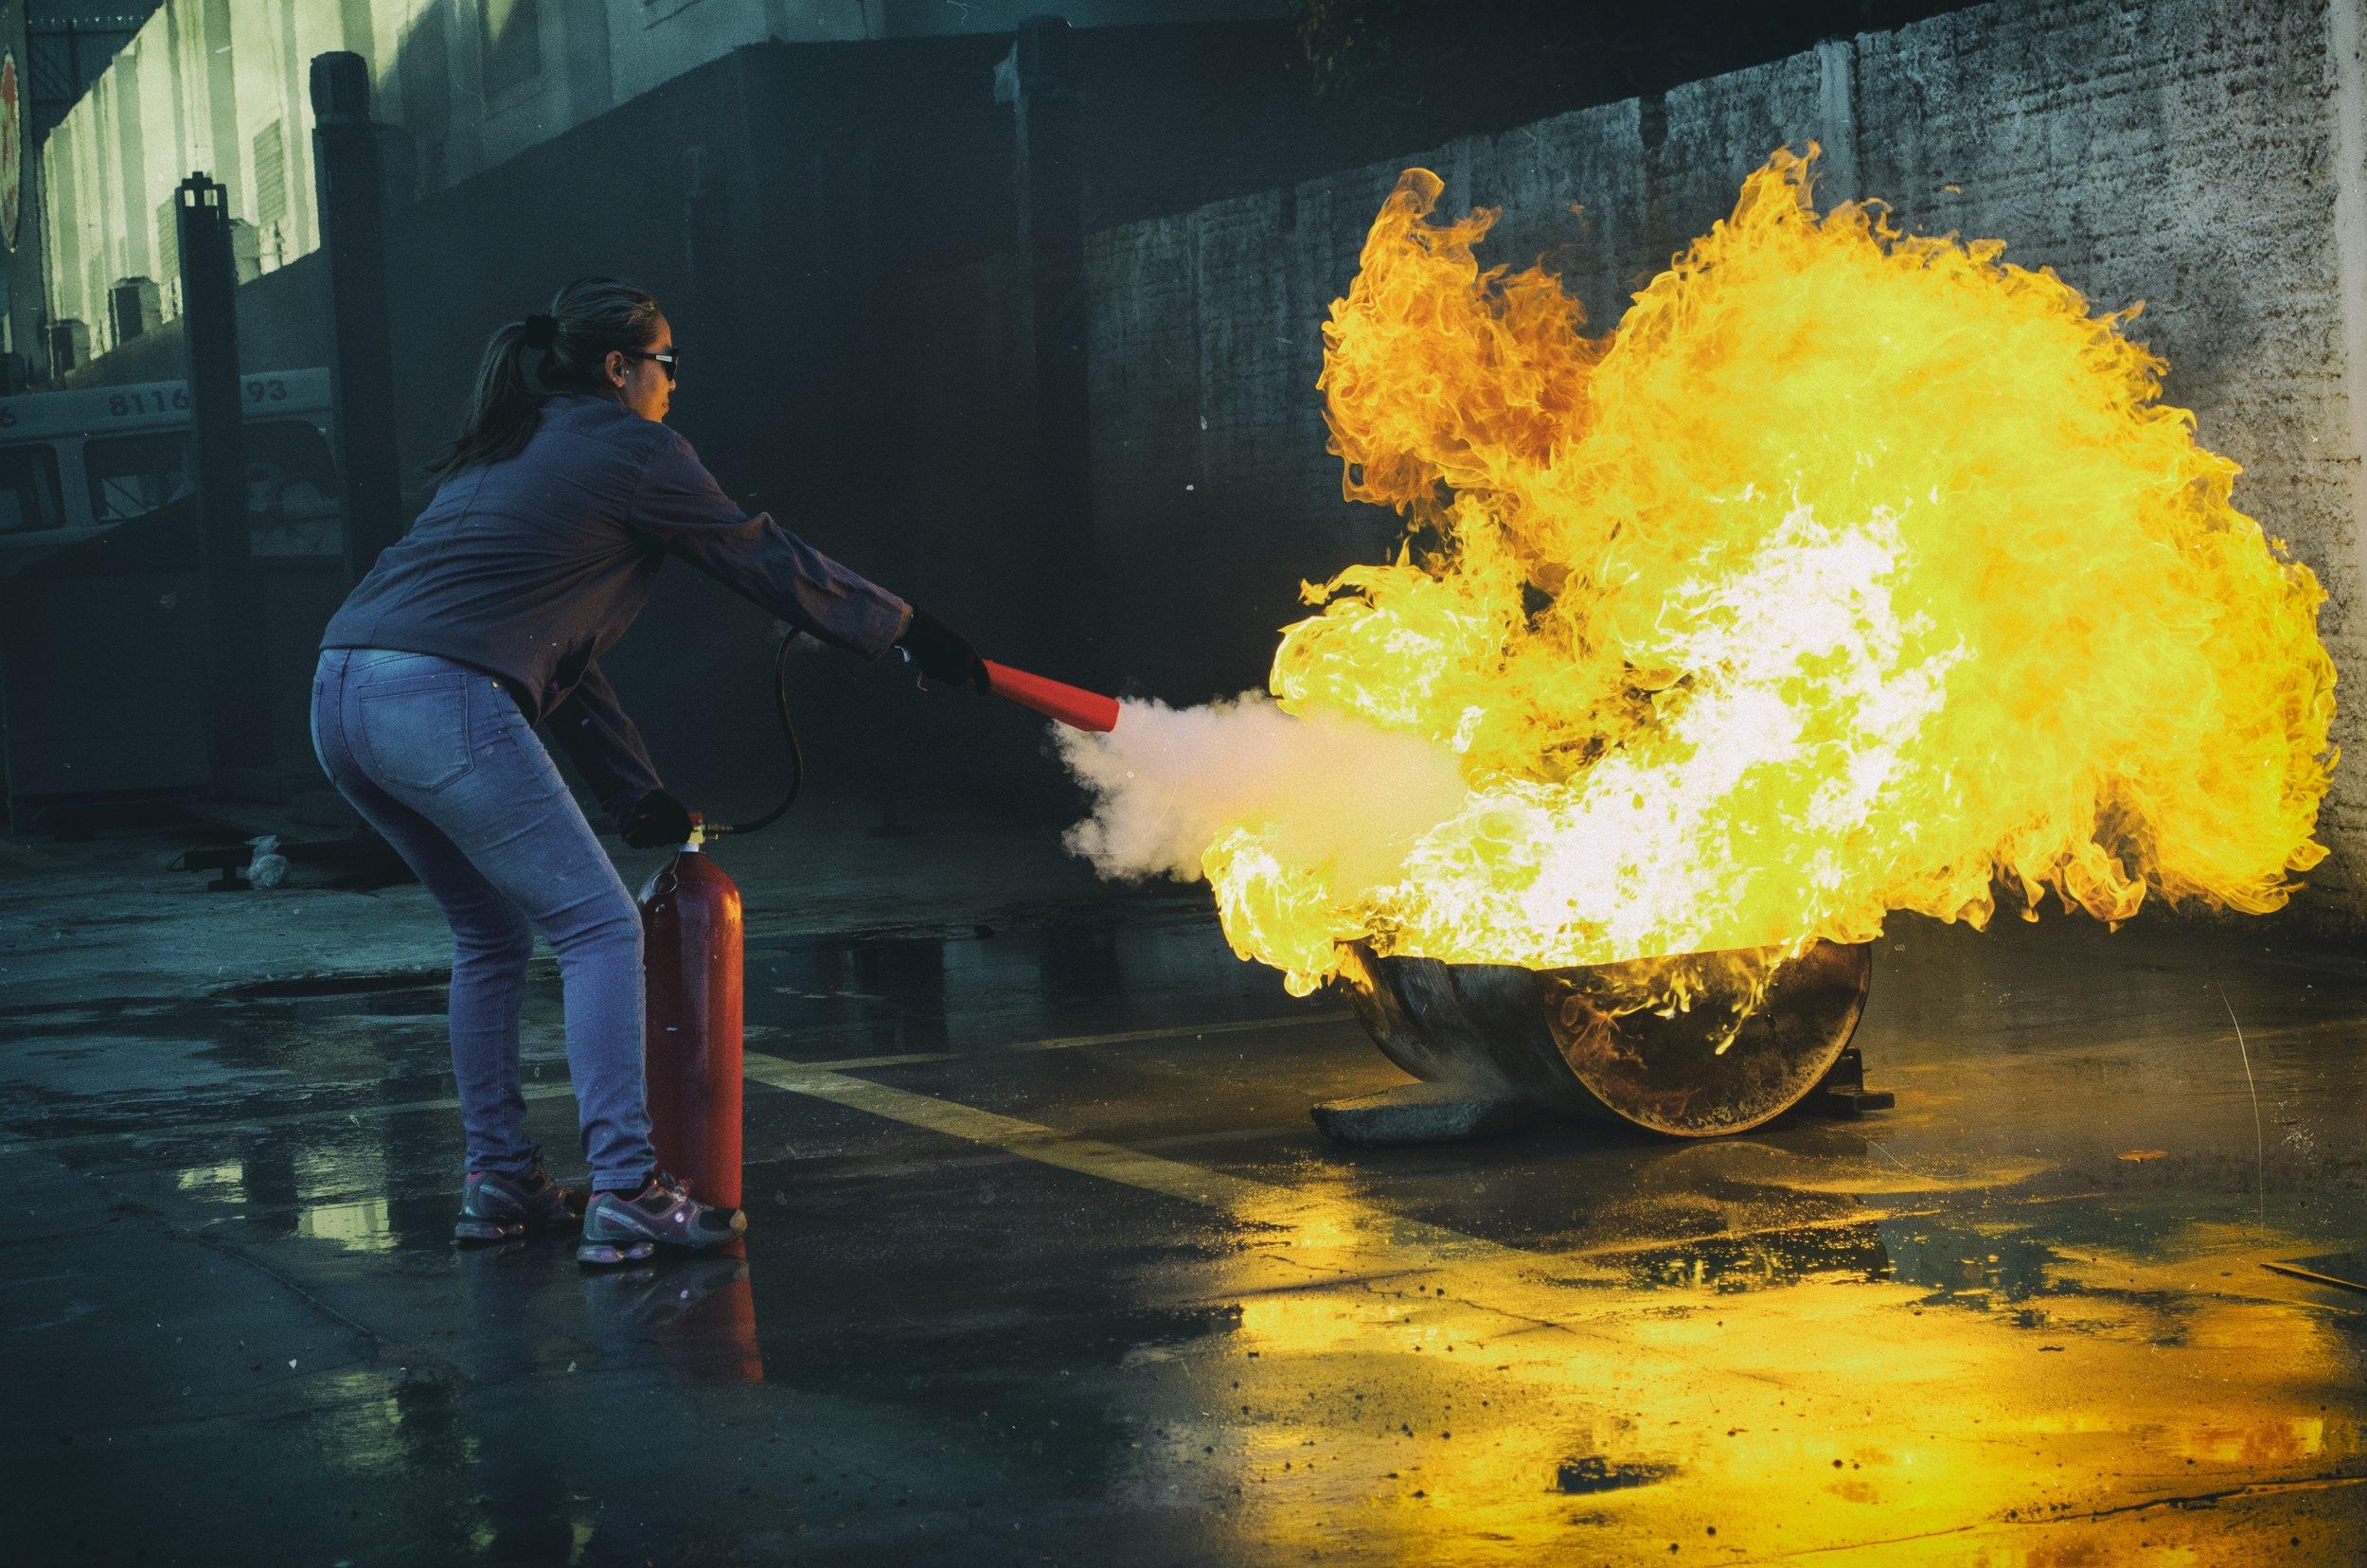 action-adult-blaze-571252.jpg